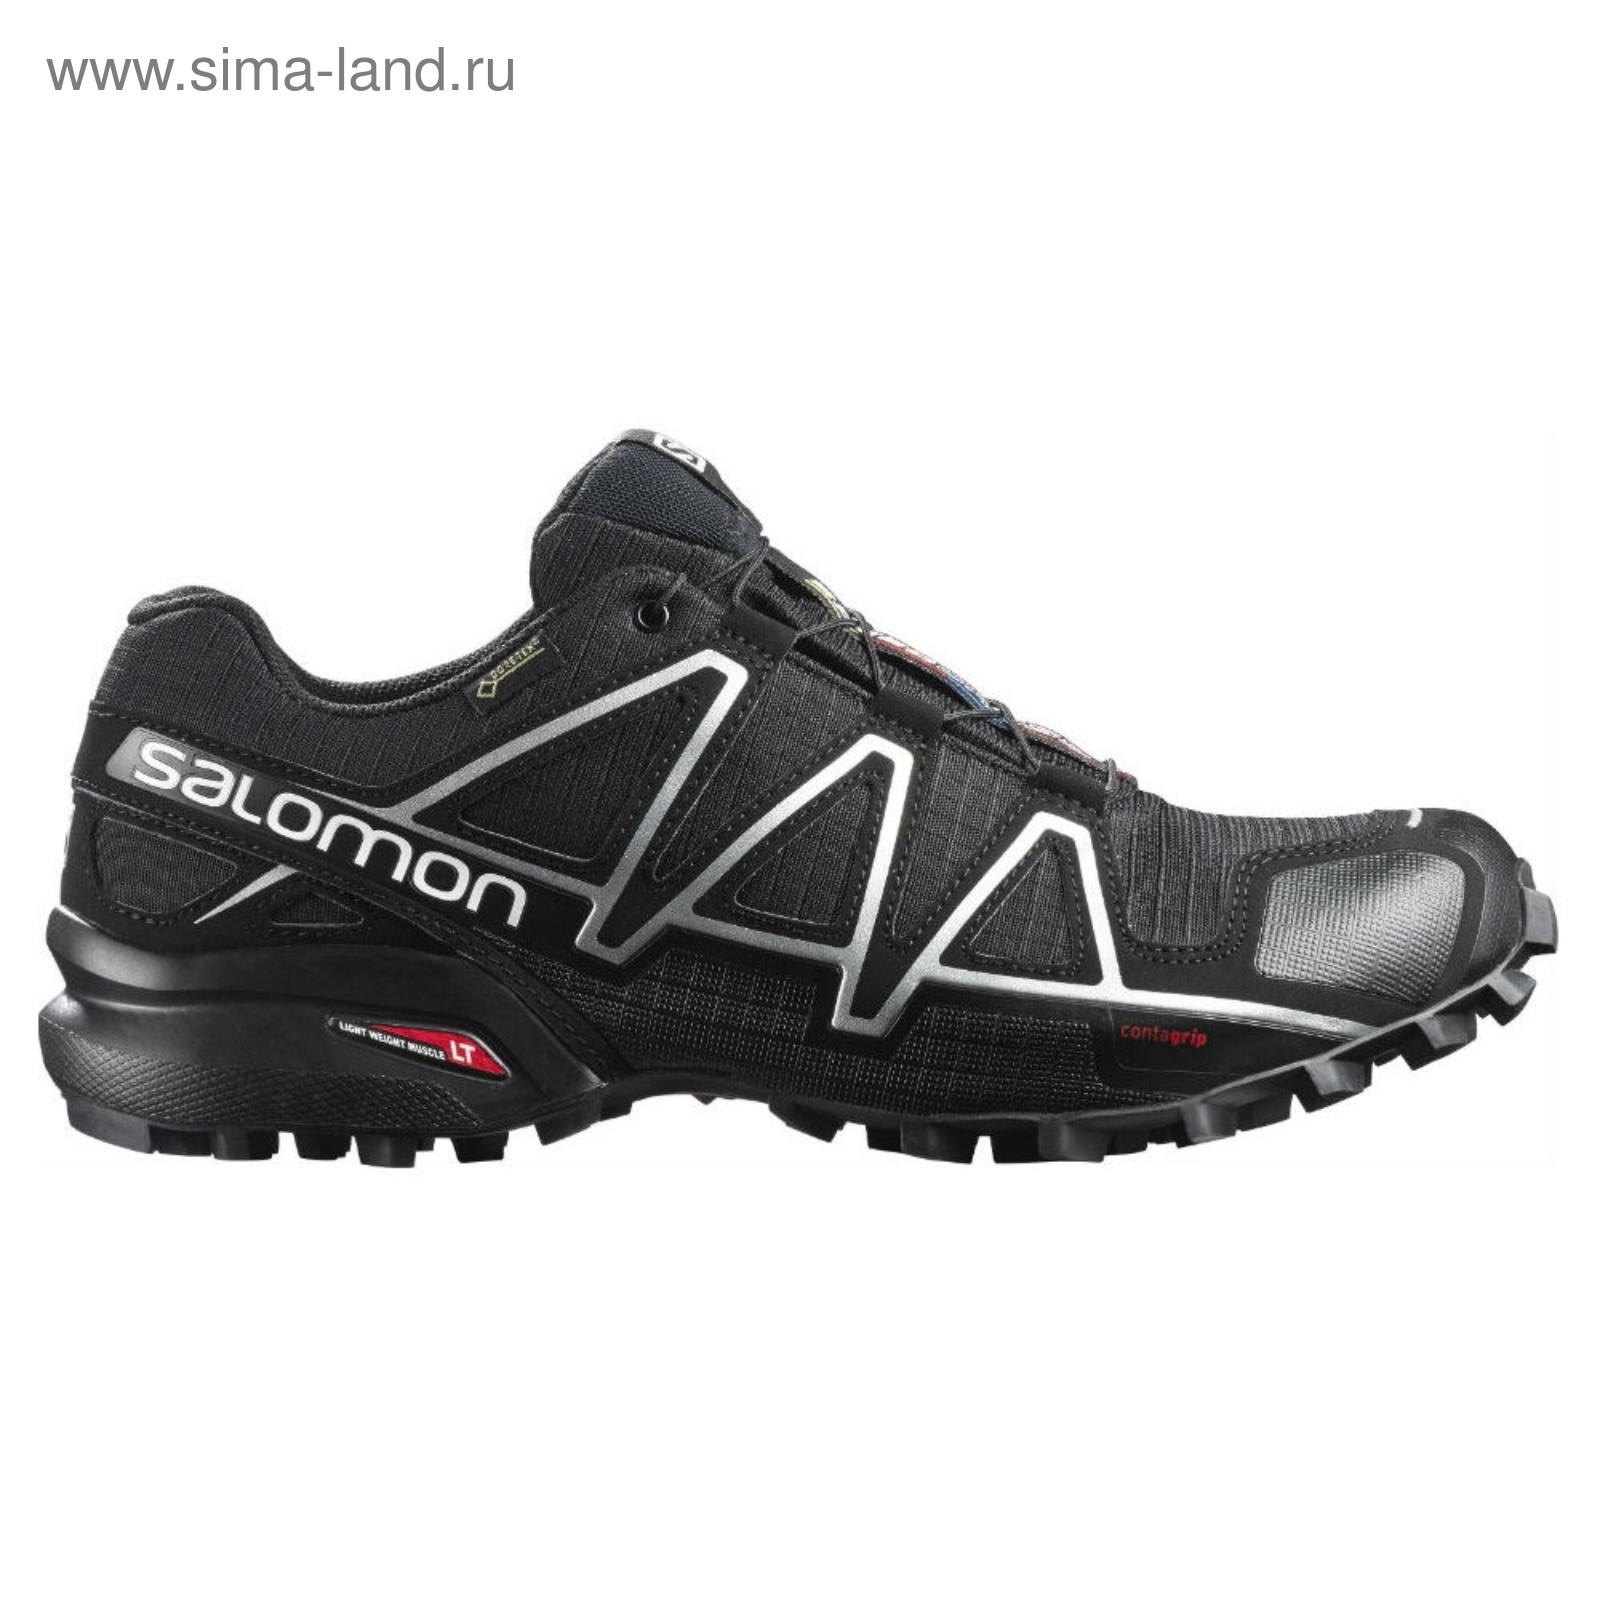 a77a8f6e Кроссовки SALOMON L38318100 SPEEDCROSS 4 GTX 9 (2837023) - Купить по ...